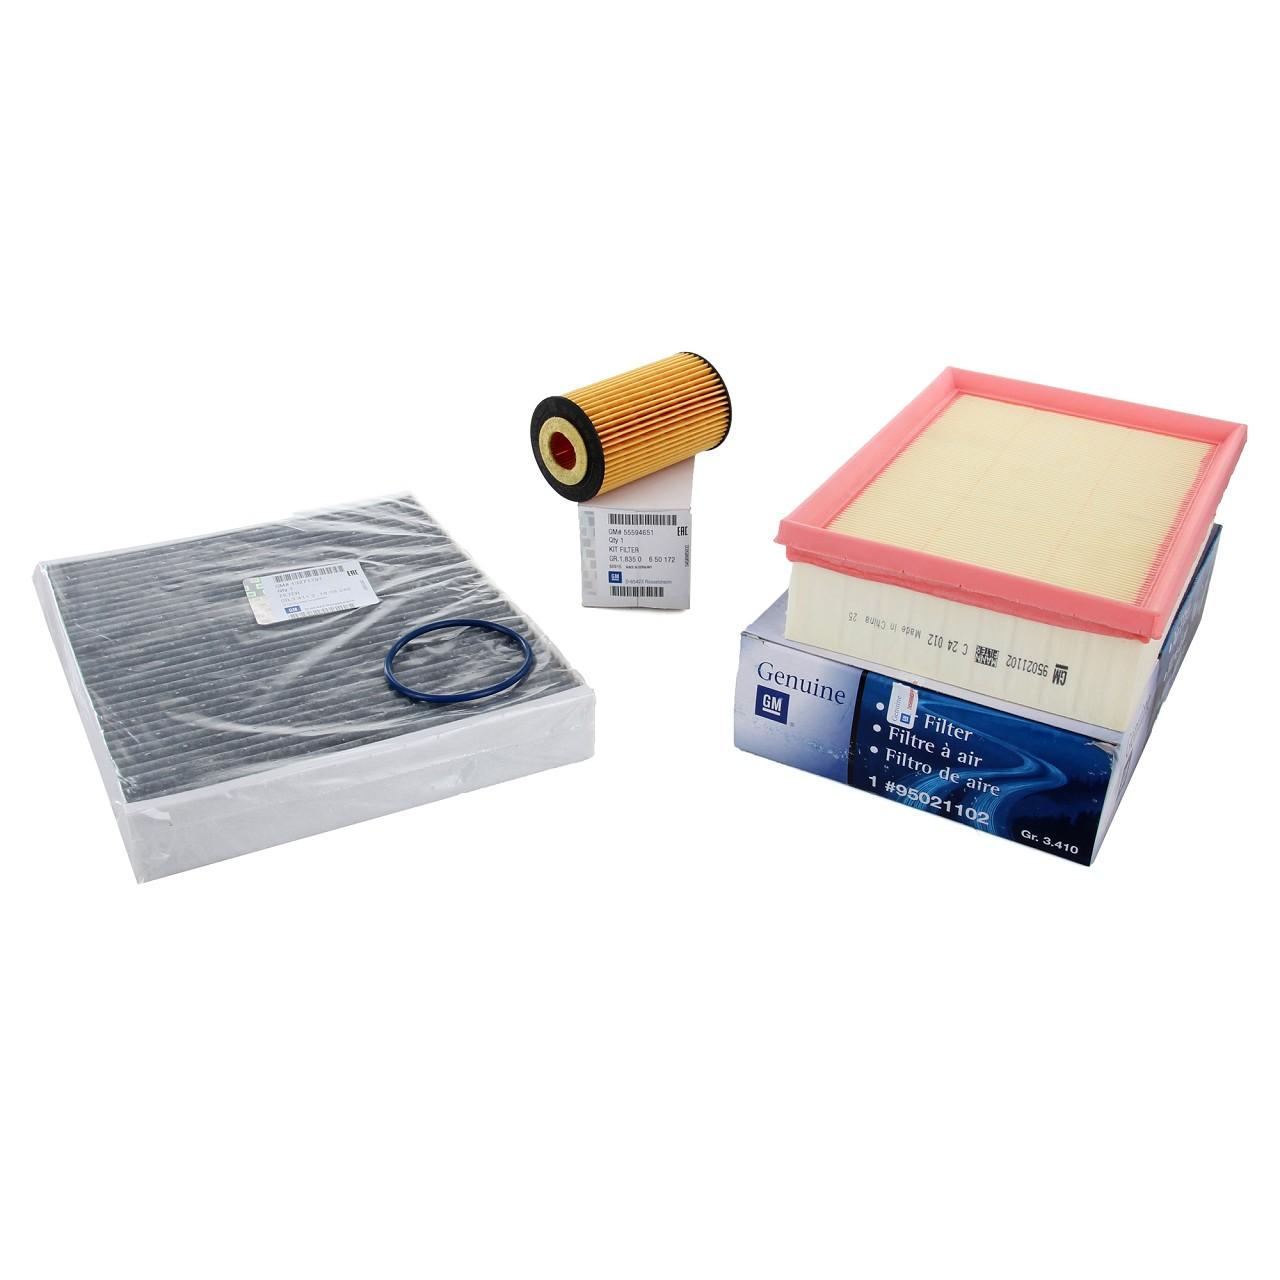 ORIGINAL Opel Inspektionskit Filterpaket MOKKA / MOKKA X 1.4 140 PS + 1.6 116 PS